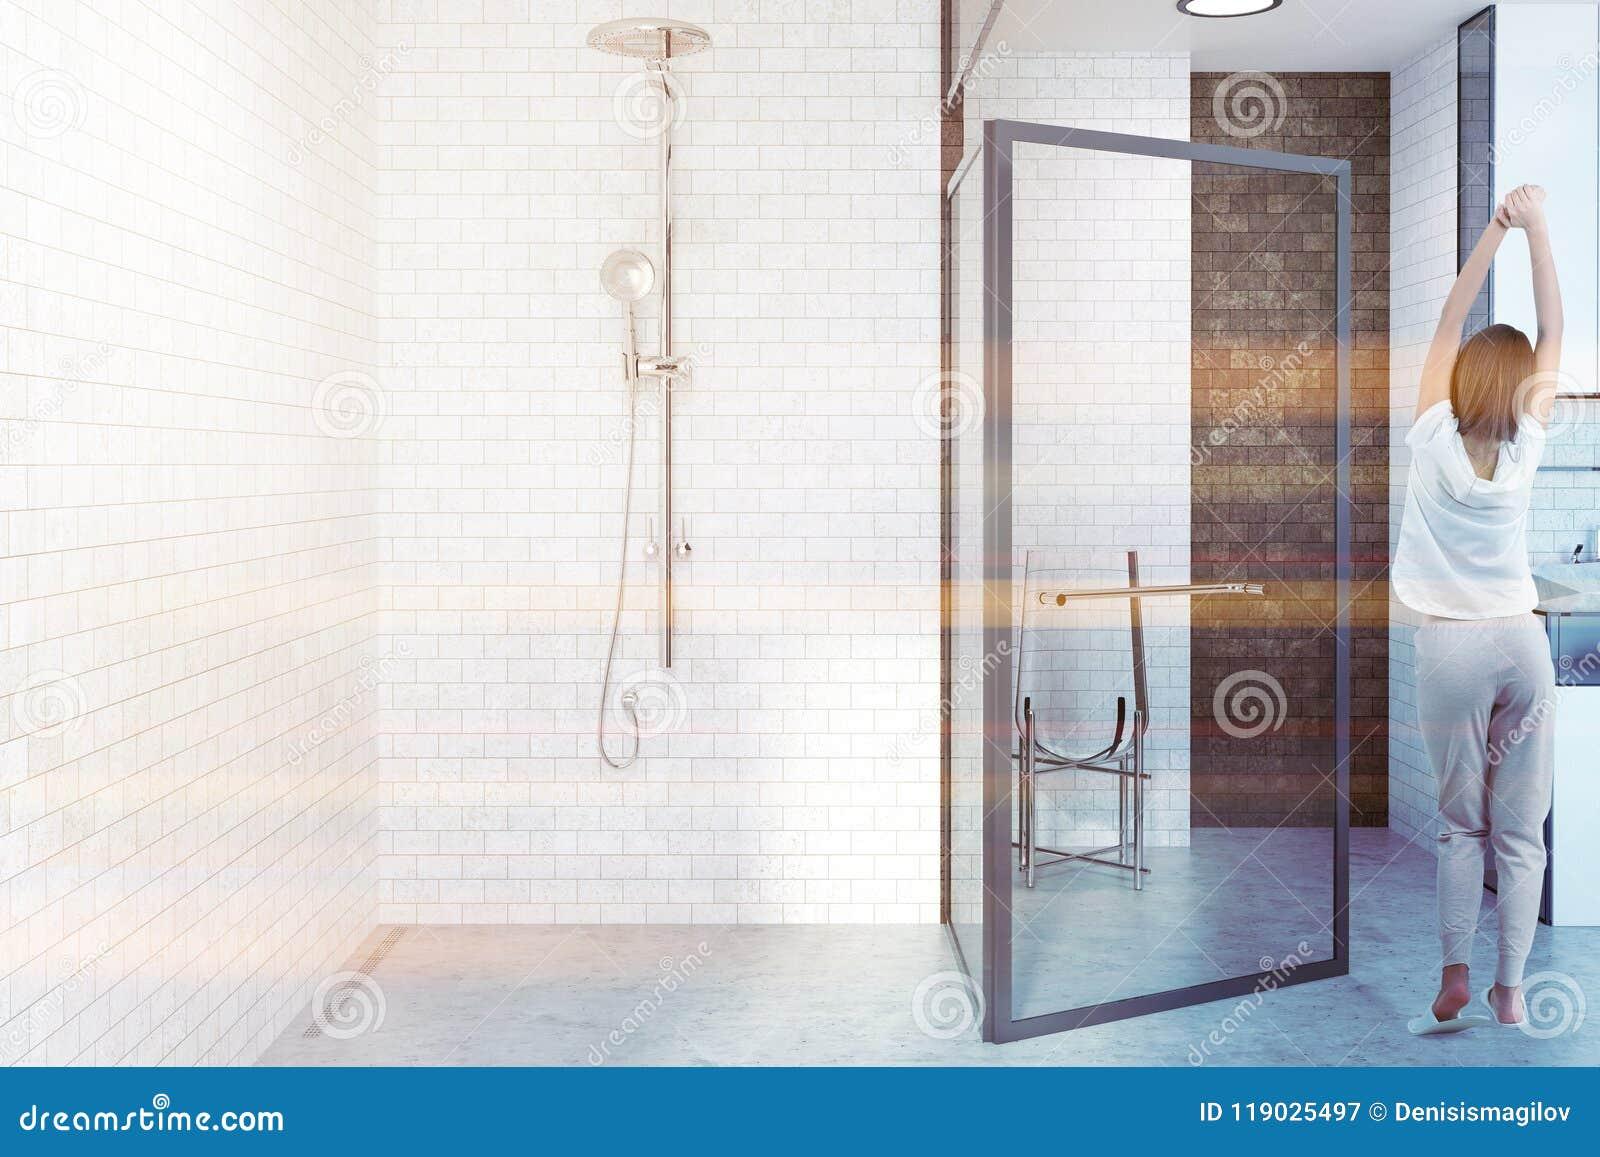 White Brick Bathroom With Glass Door Woman Stock Illustration